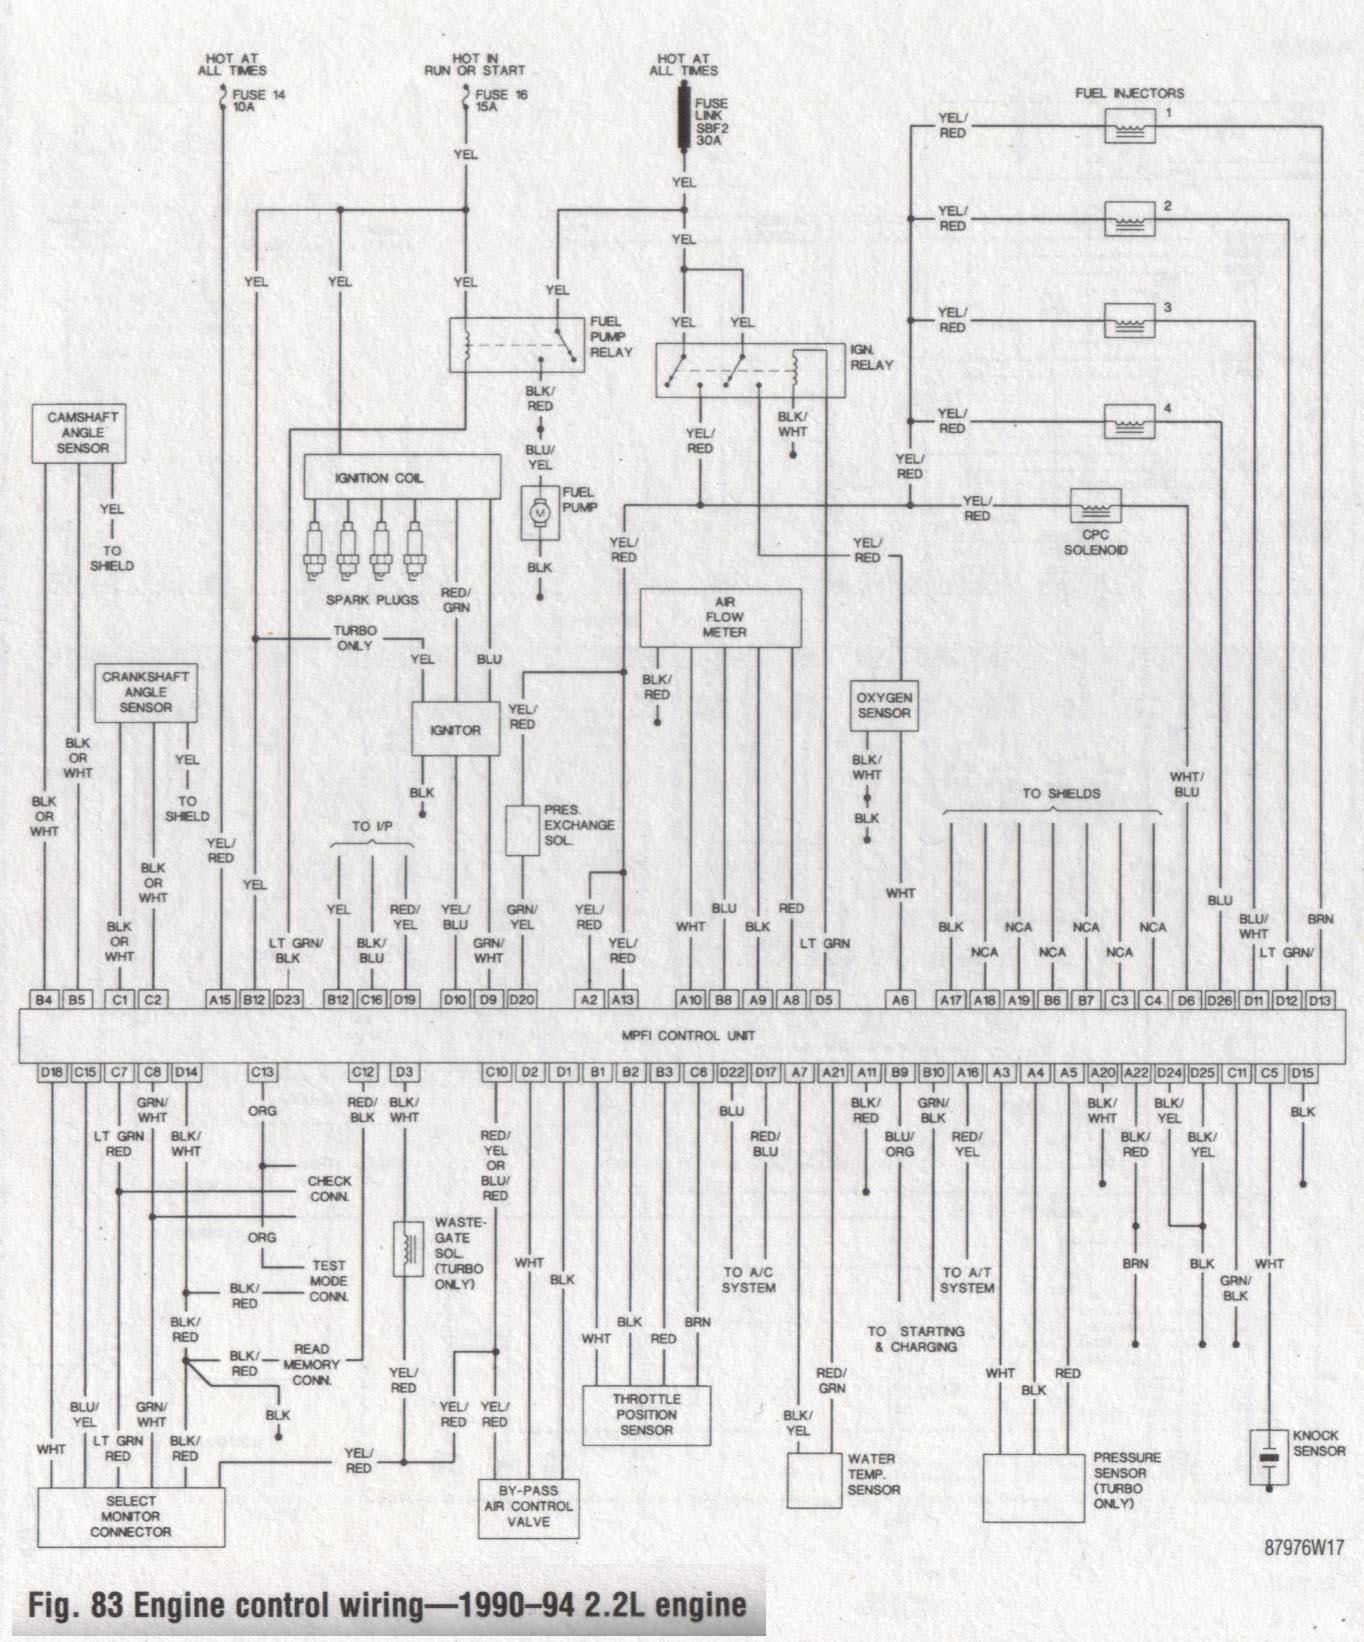 subaru forester wiring harness diagram rotary drum switch 2001 door lock html